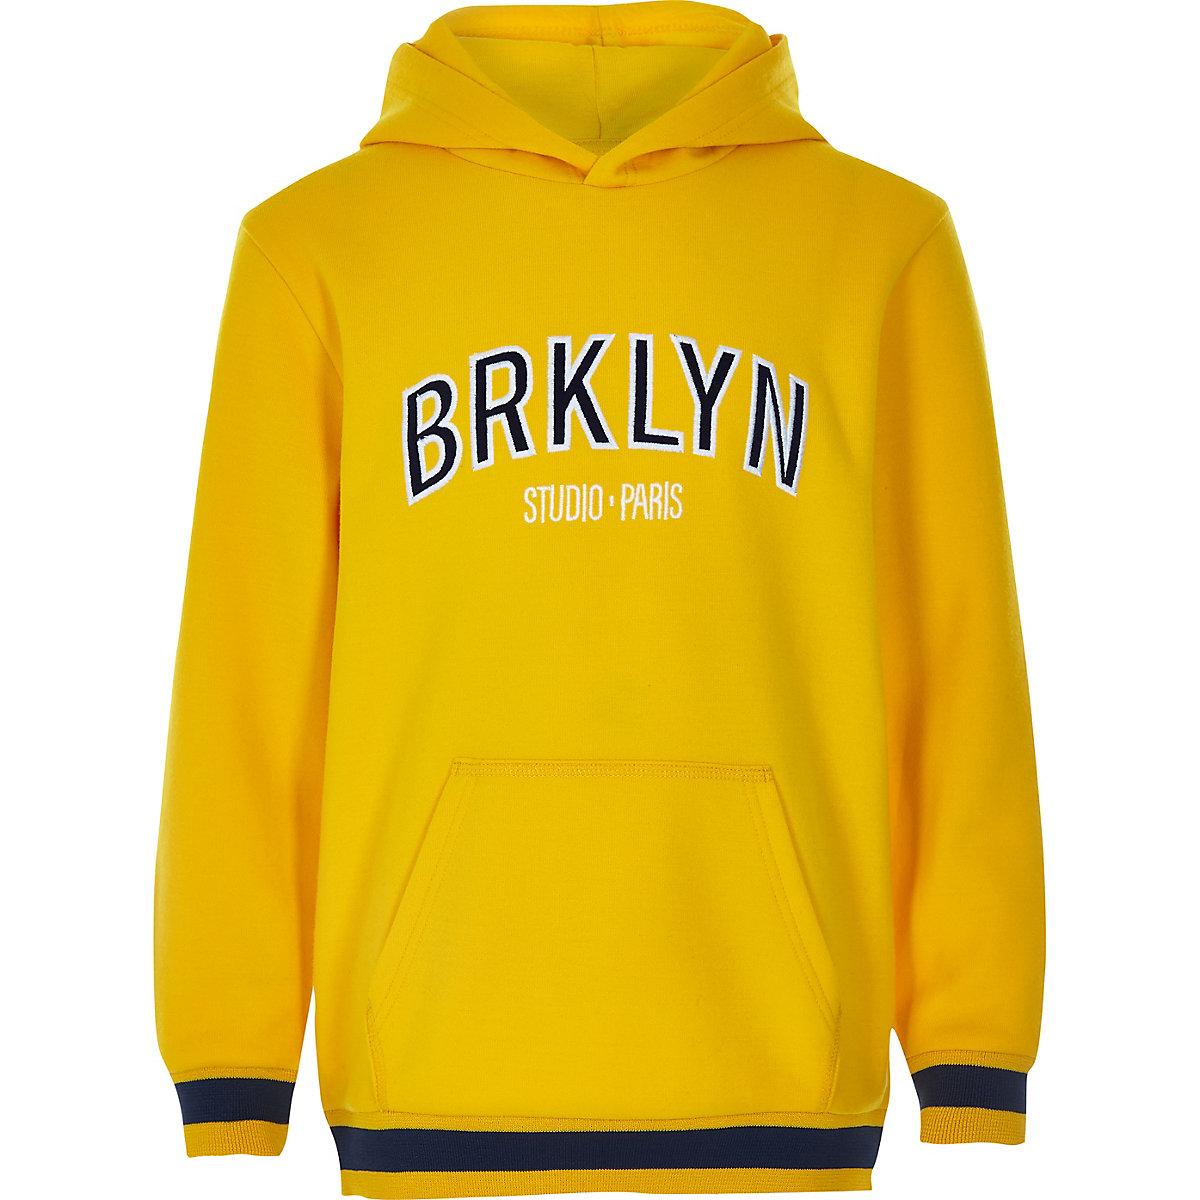 Boys yellow 'Brklyn' hoodie